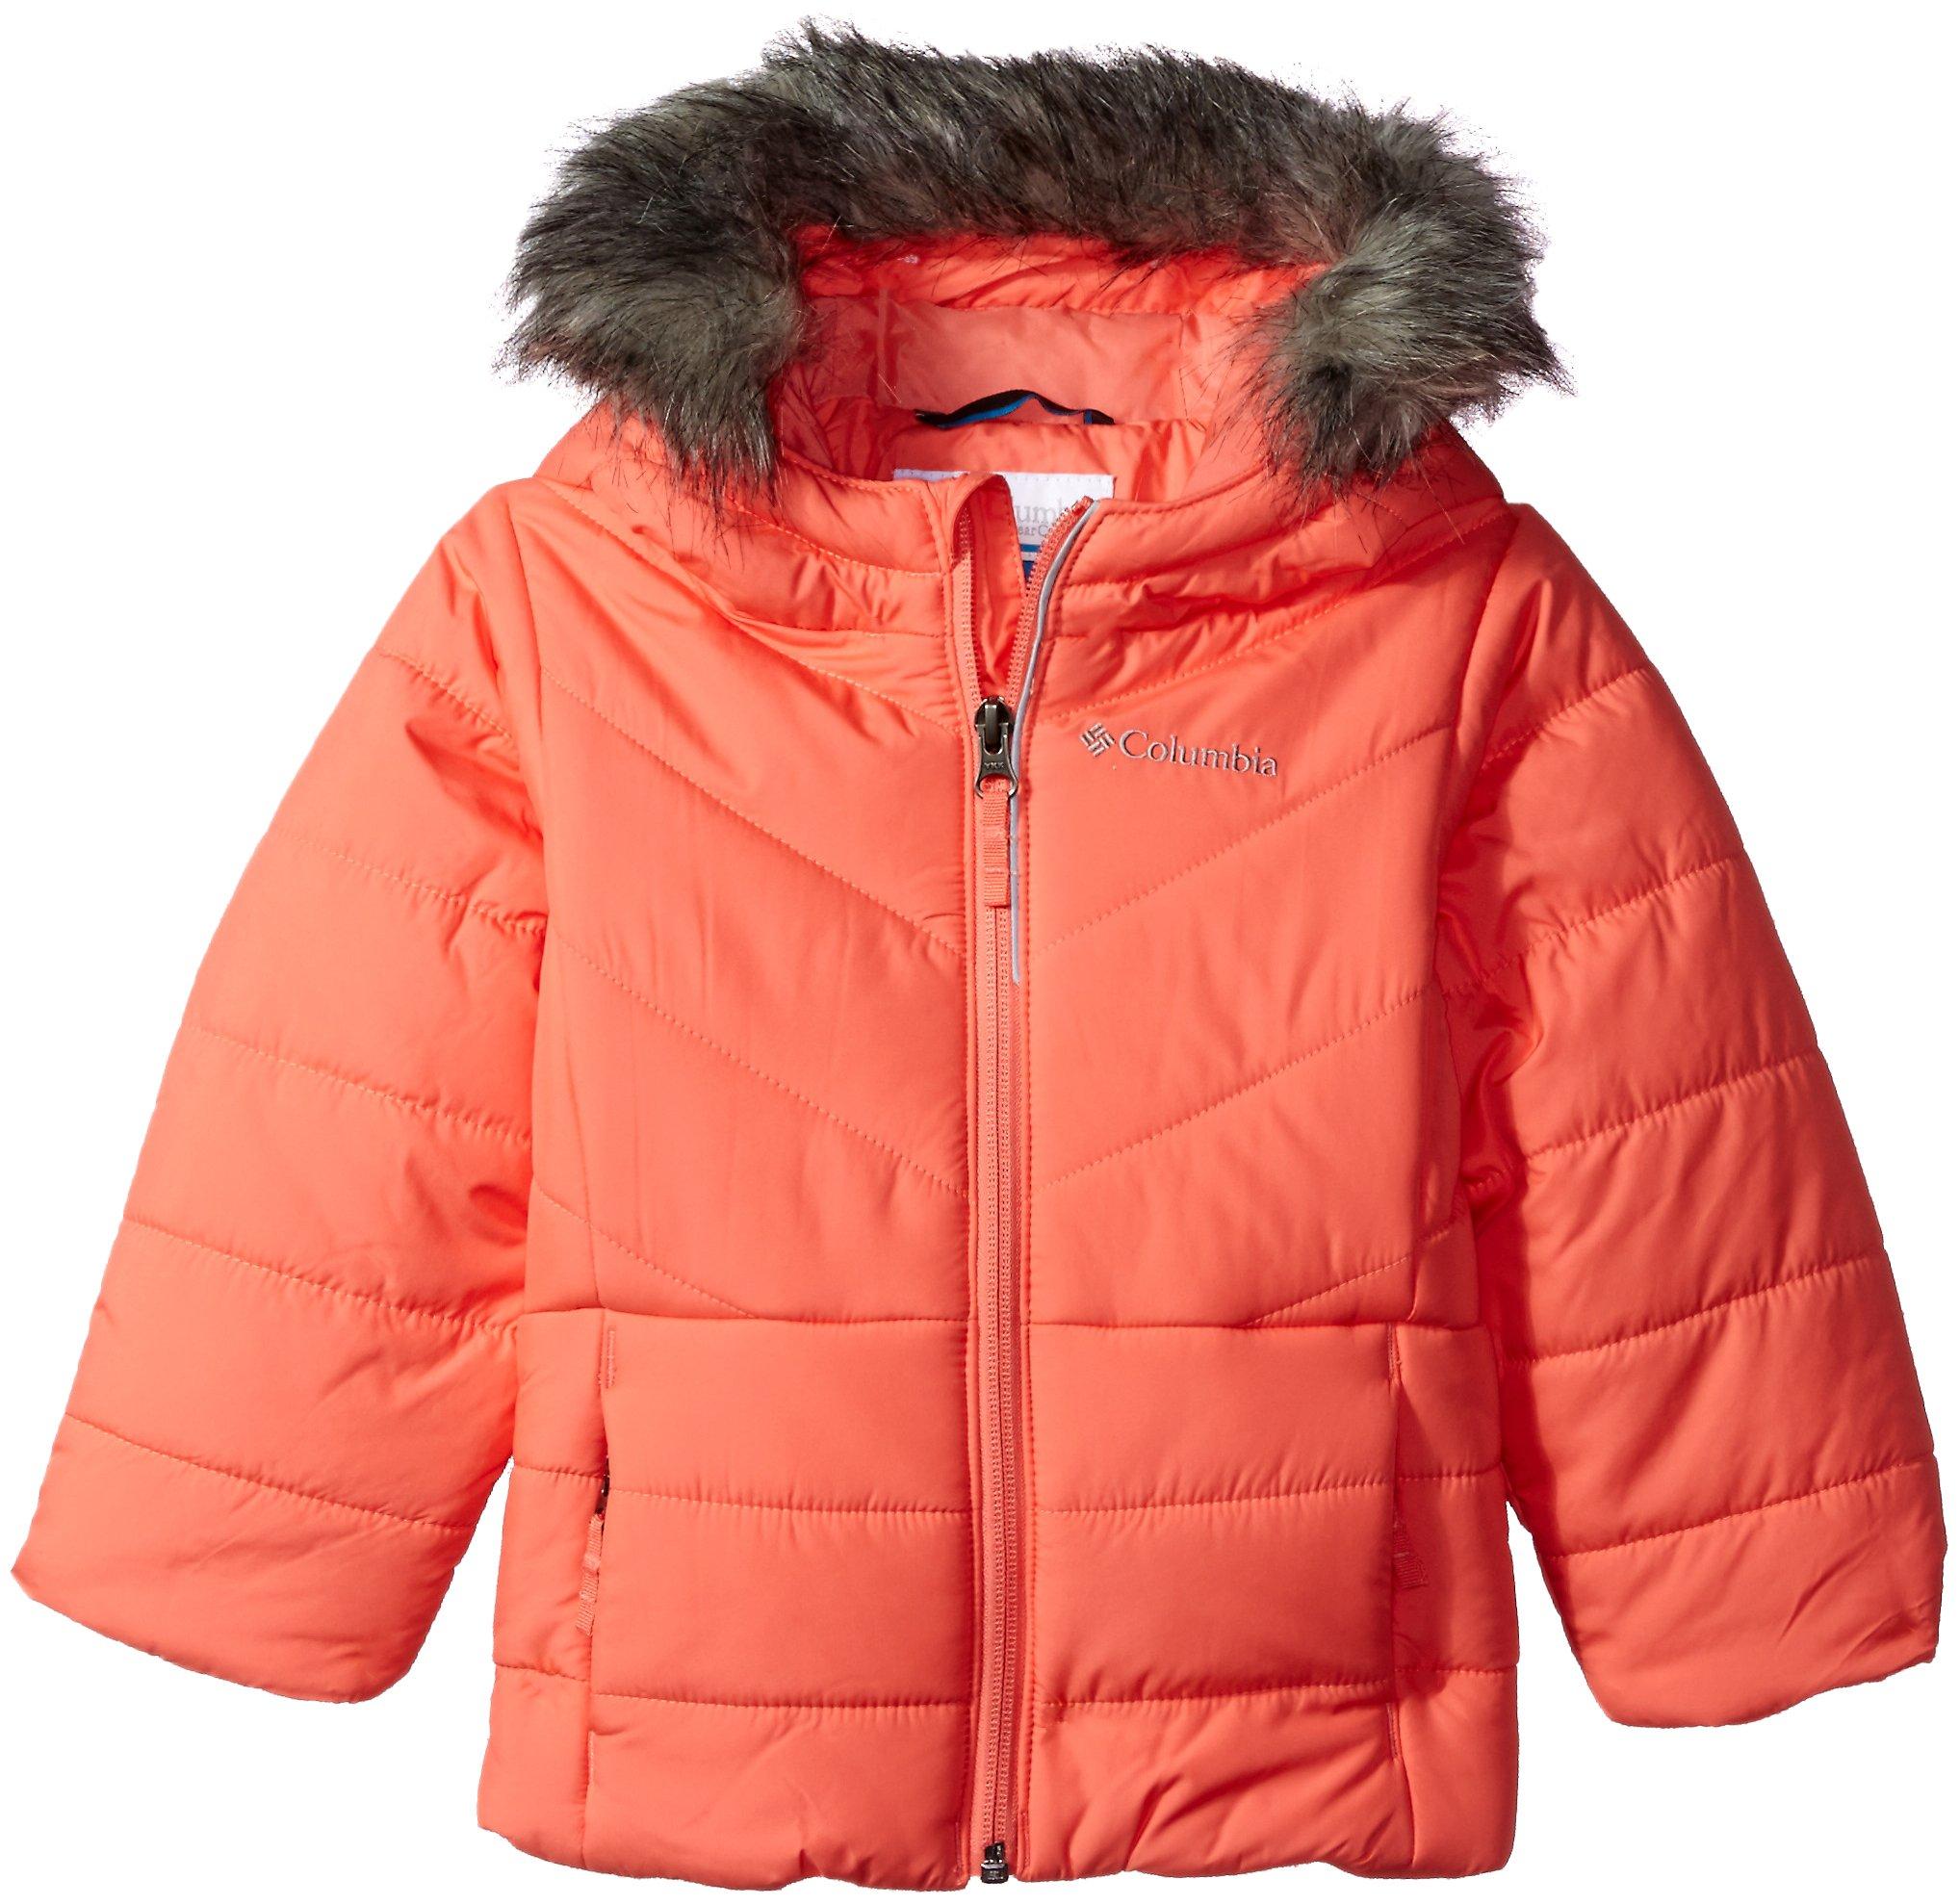 Columbia Little Girls' Katelyn Crest Jacket, Hot Coral, 4T